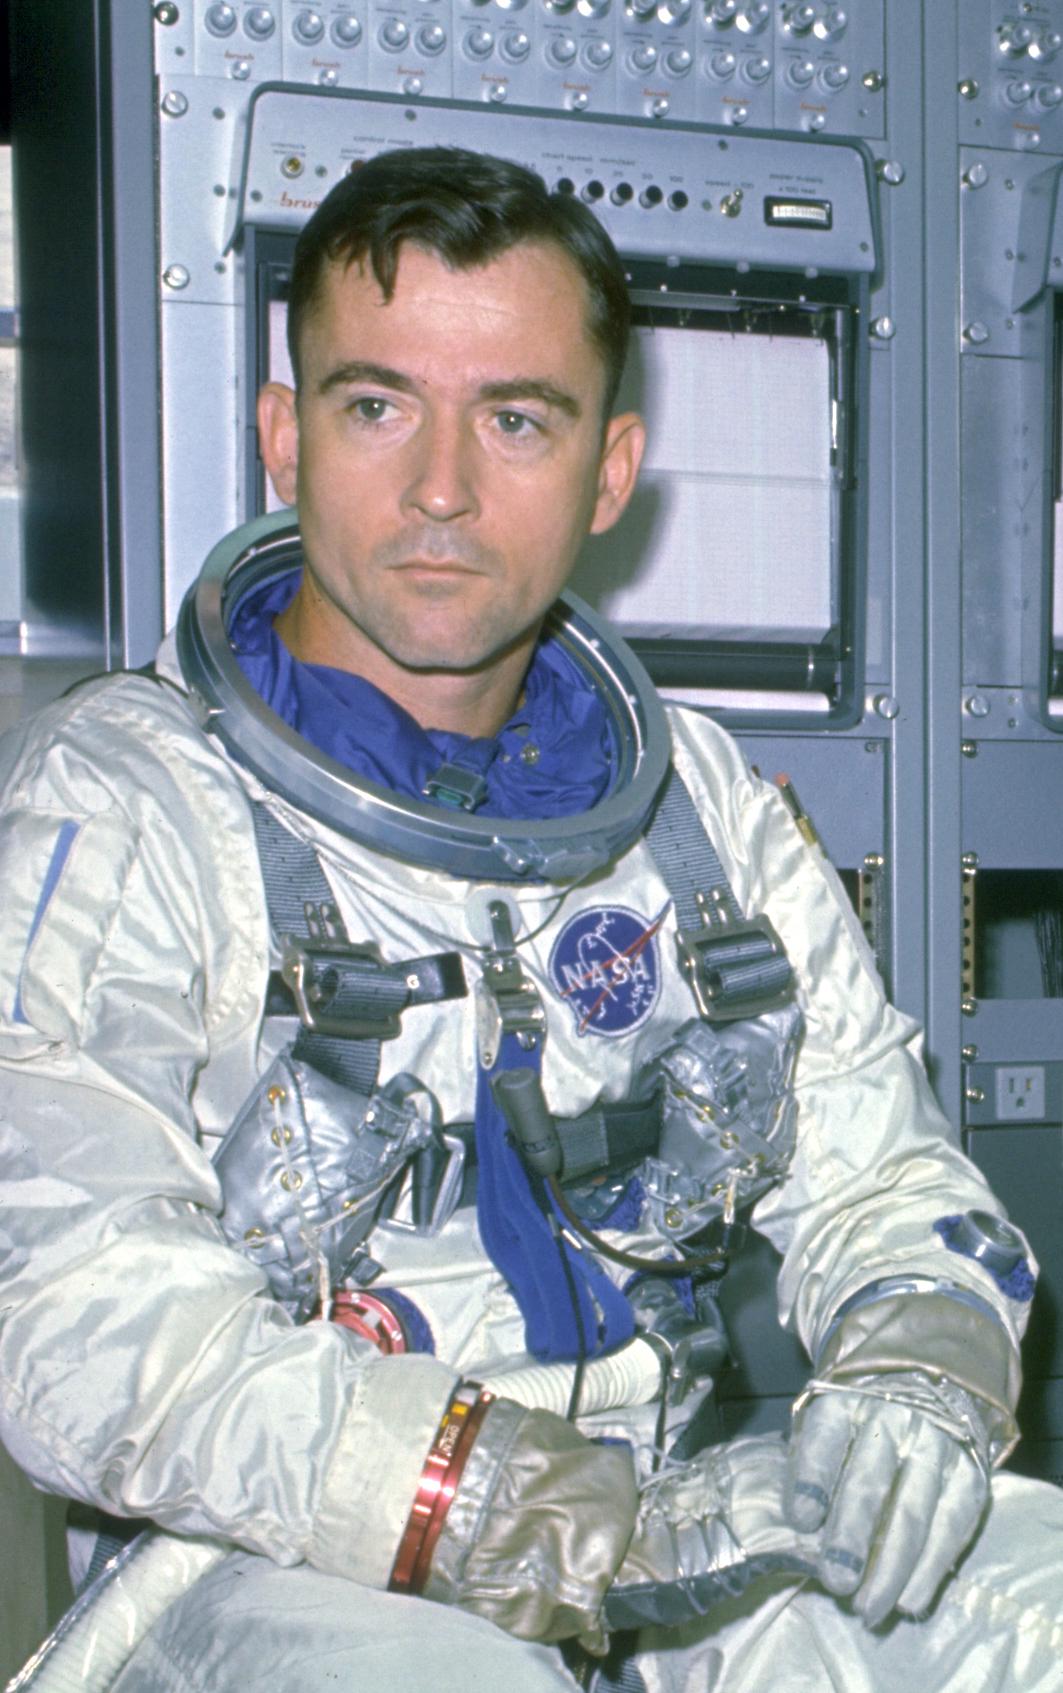 john young astronaut autograph - photo #16